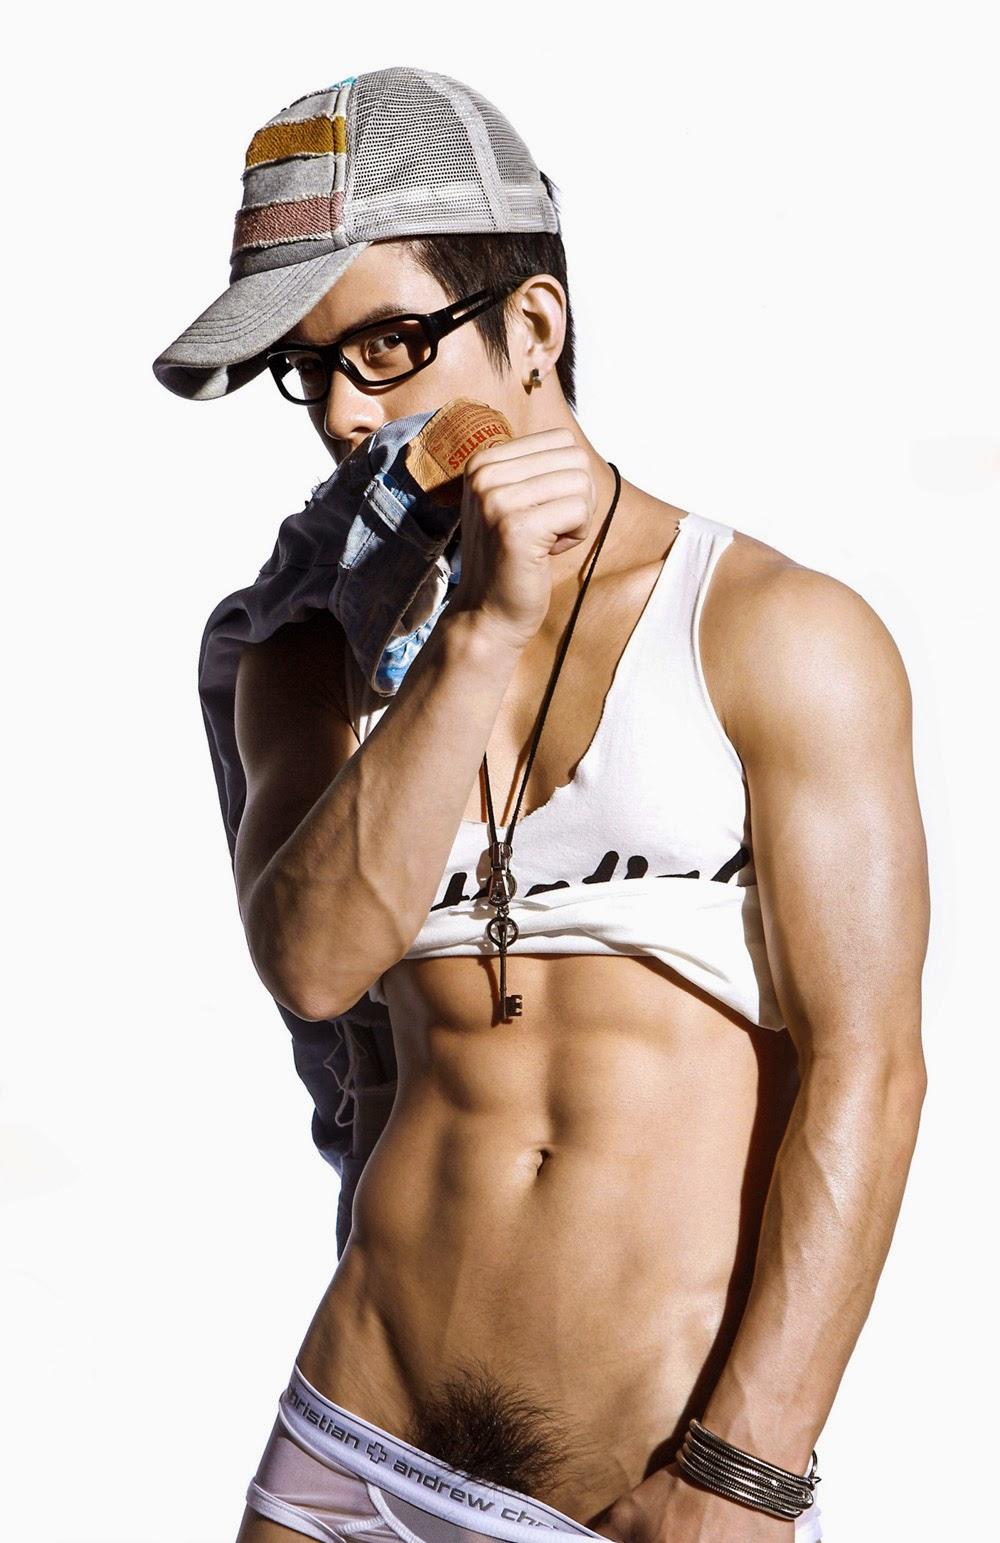 http://gayasiancollection.com/hot-asian-boys-chinese-acrobat/